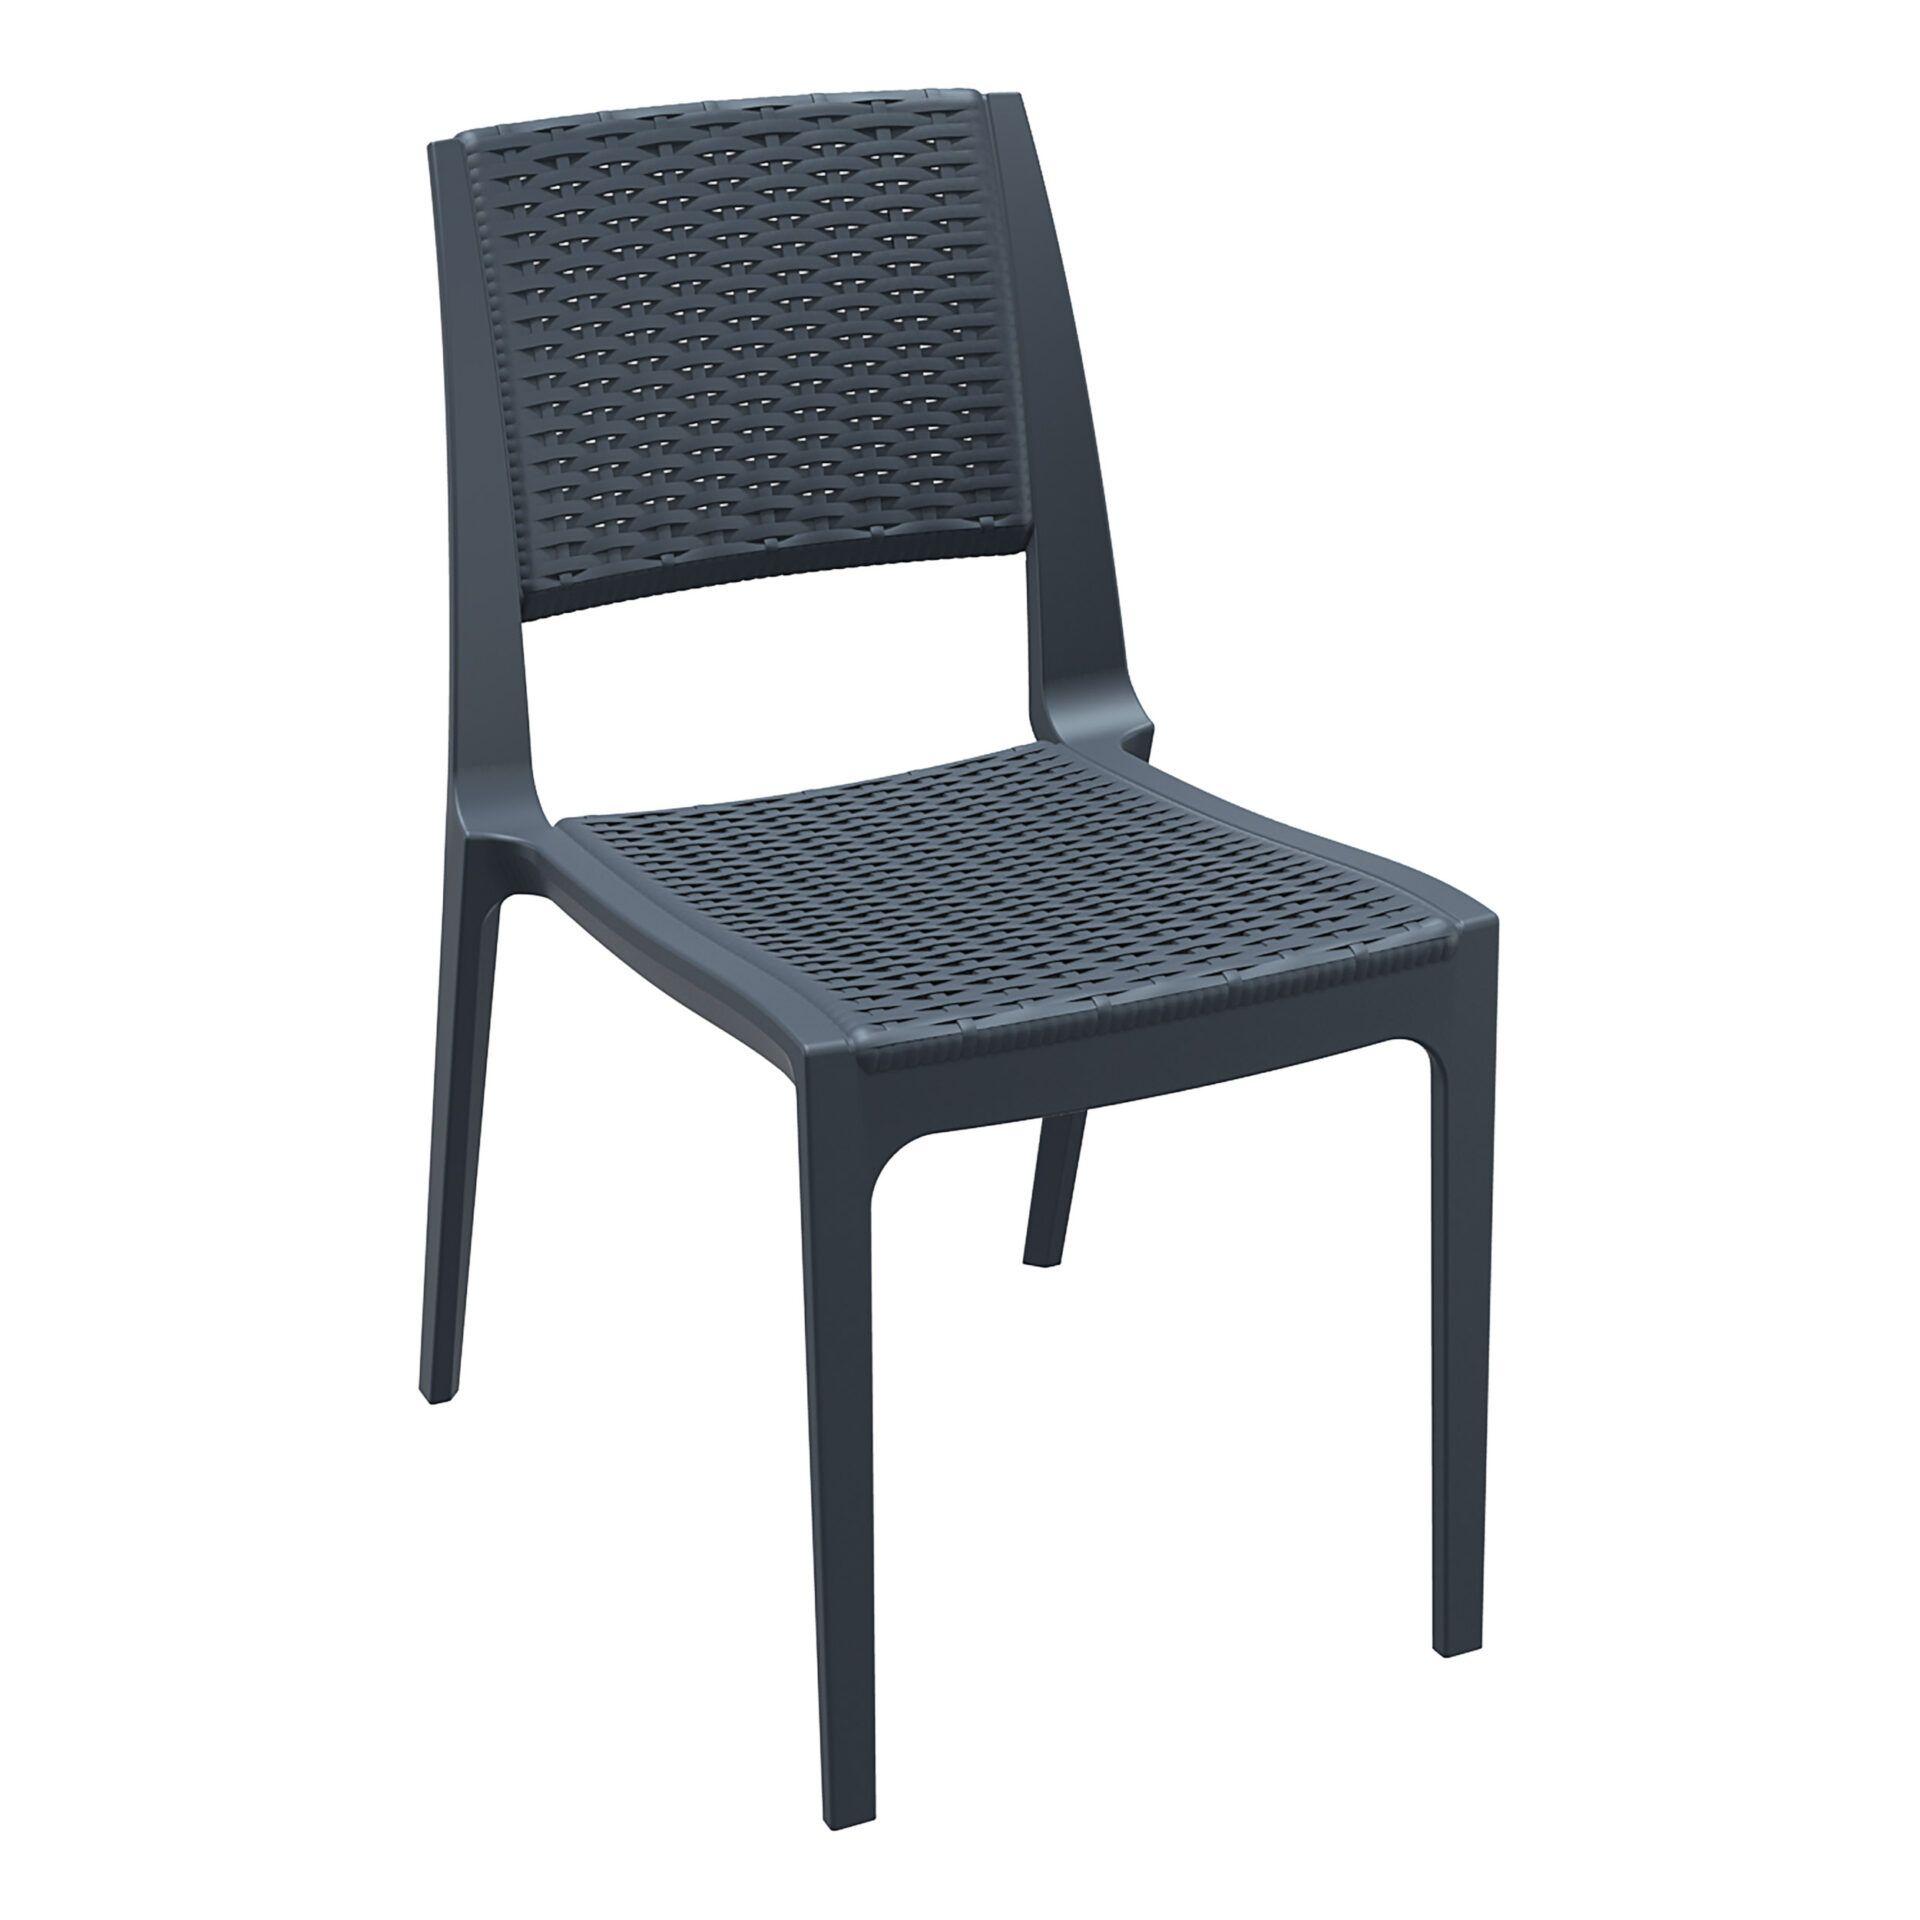 resin rattan outdoor cafe verona chair darkgrey front side